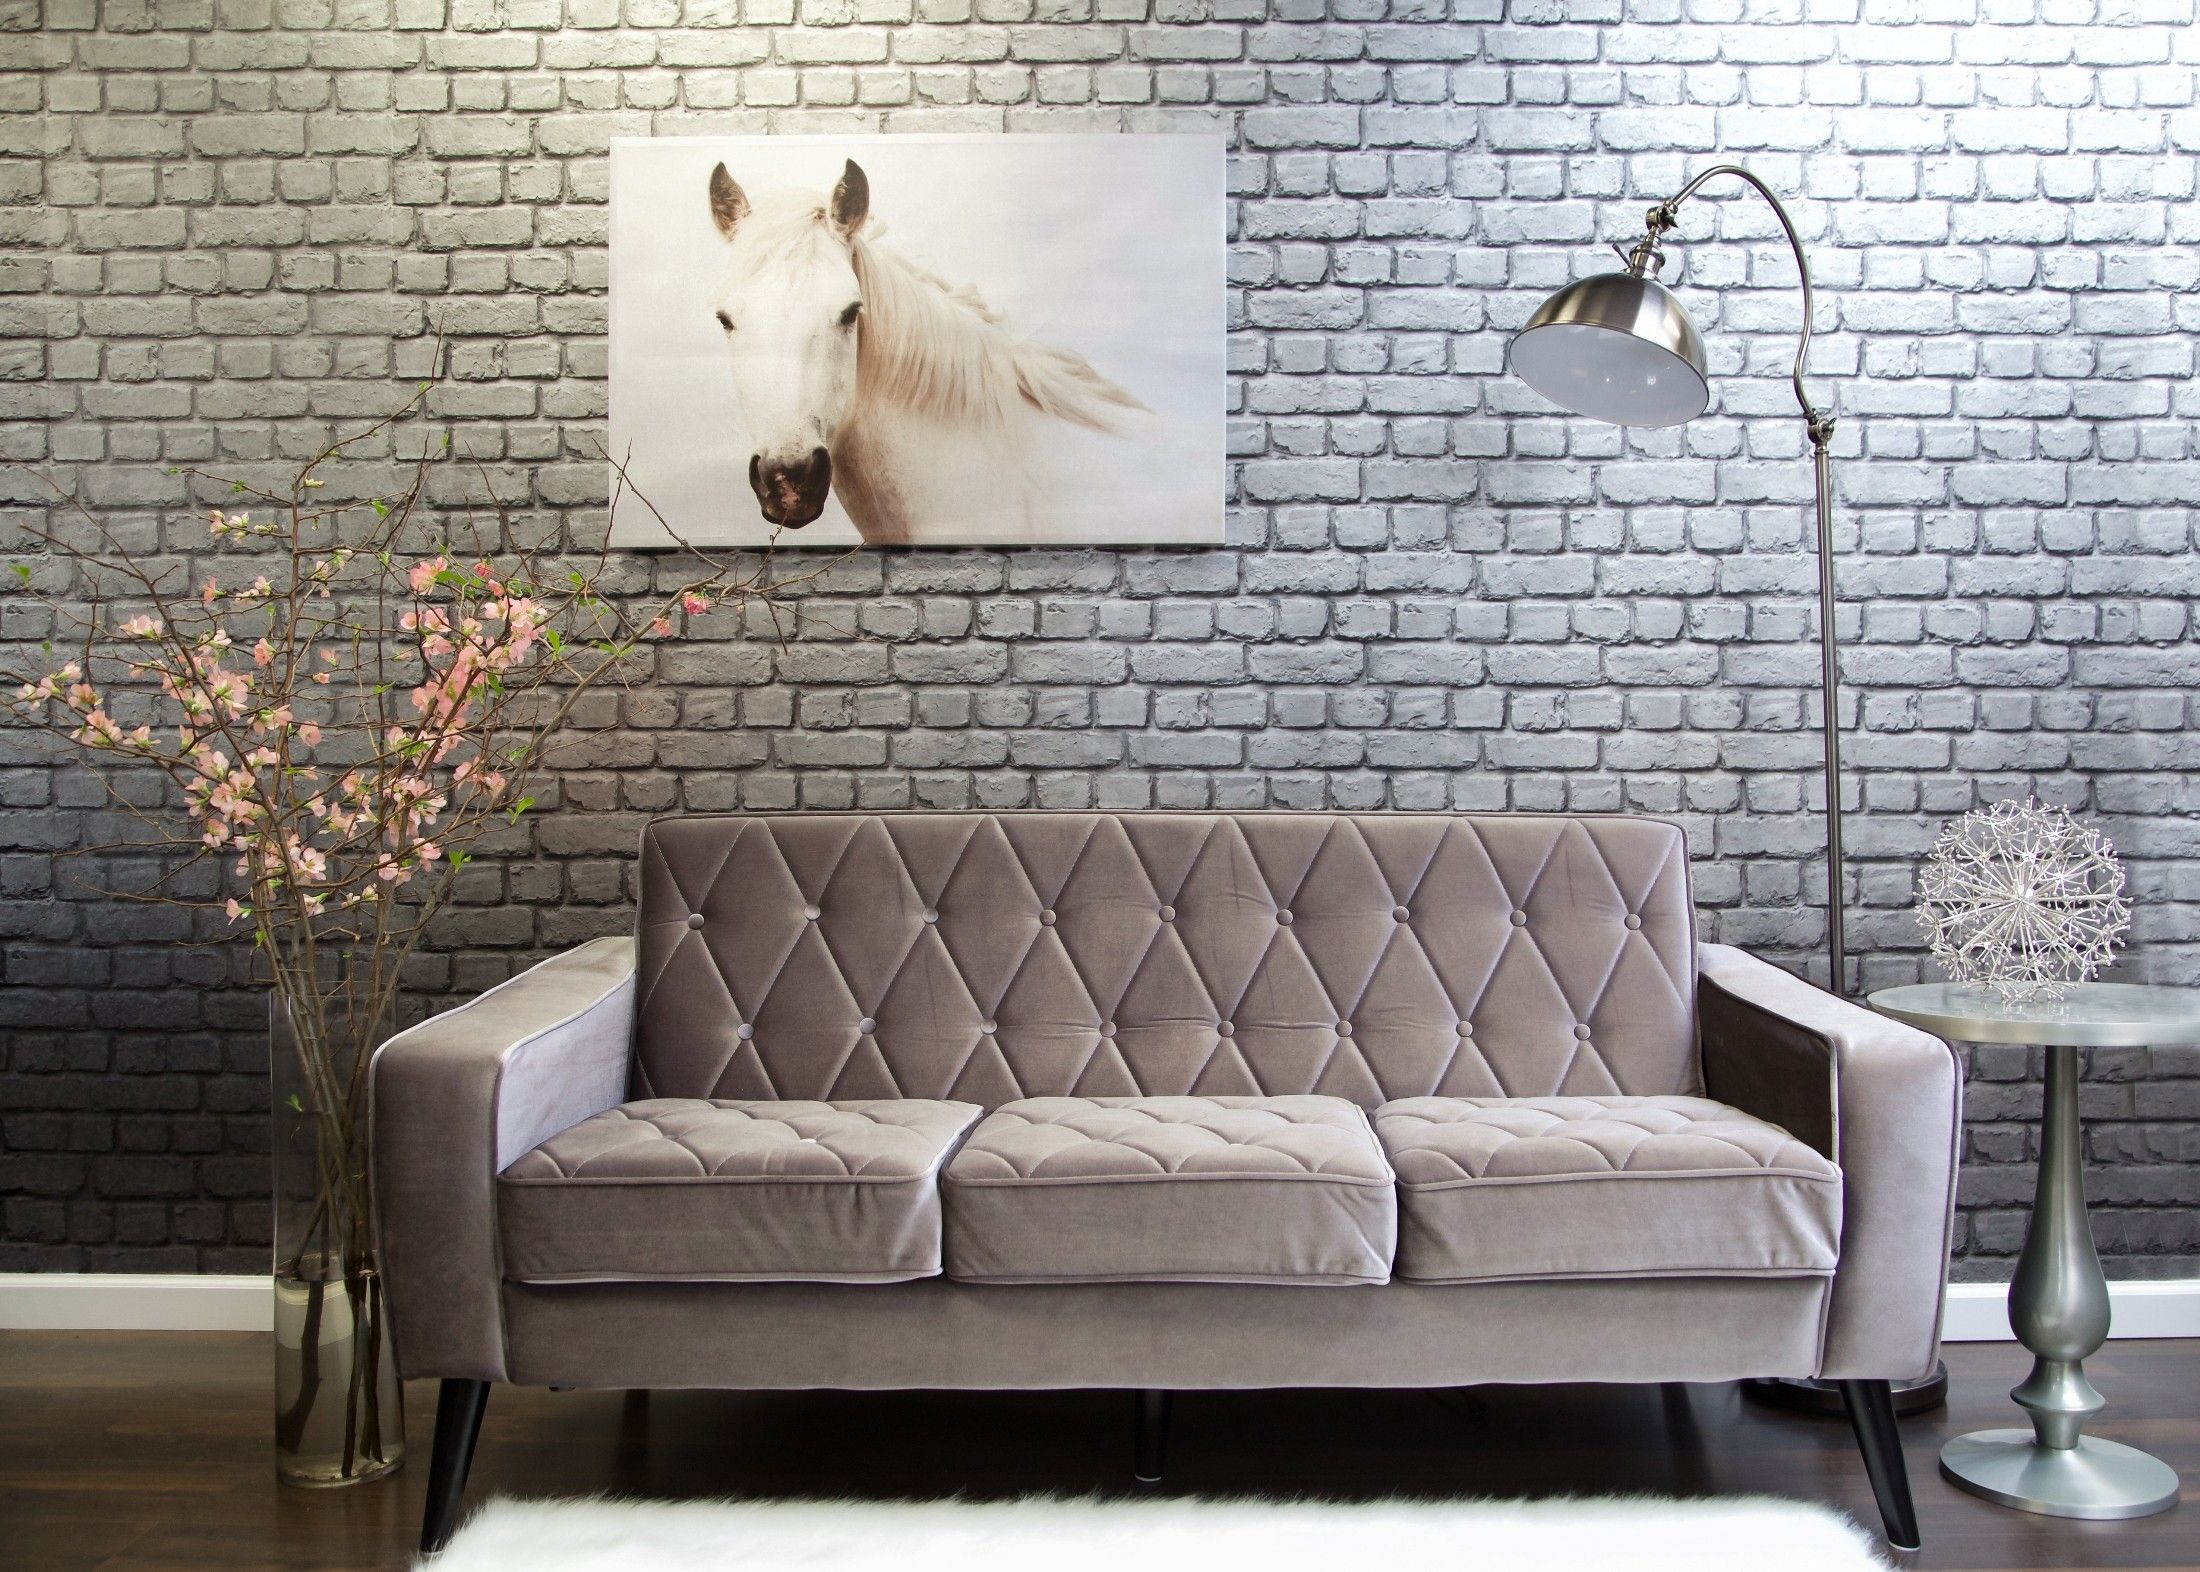 Bowery Gray Velvet Sofa | Home | Pinterest | Kiln dried wood, Gray ...